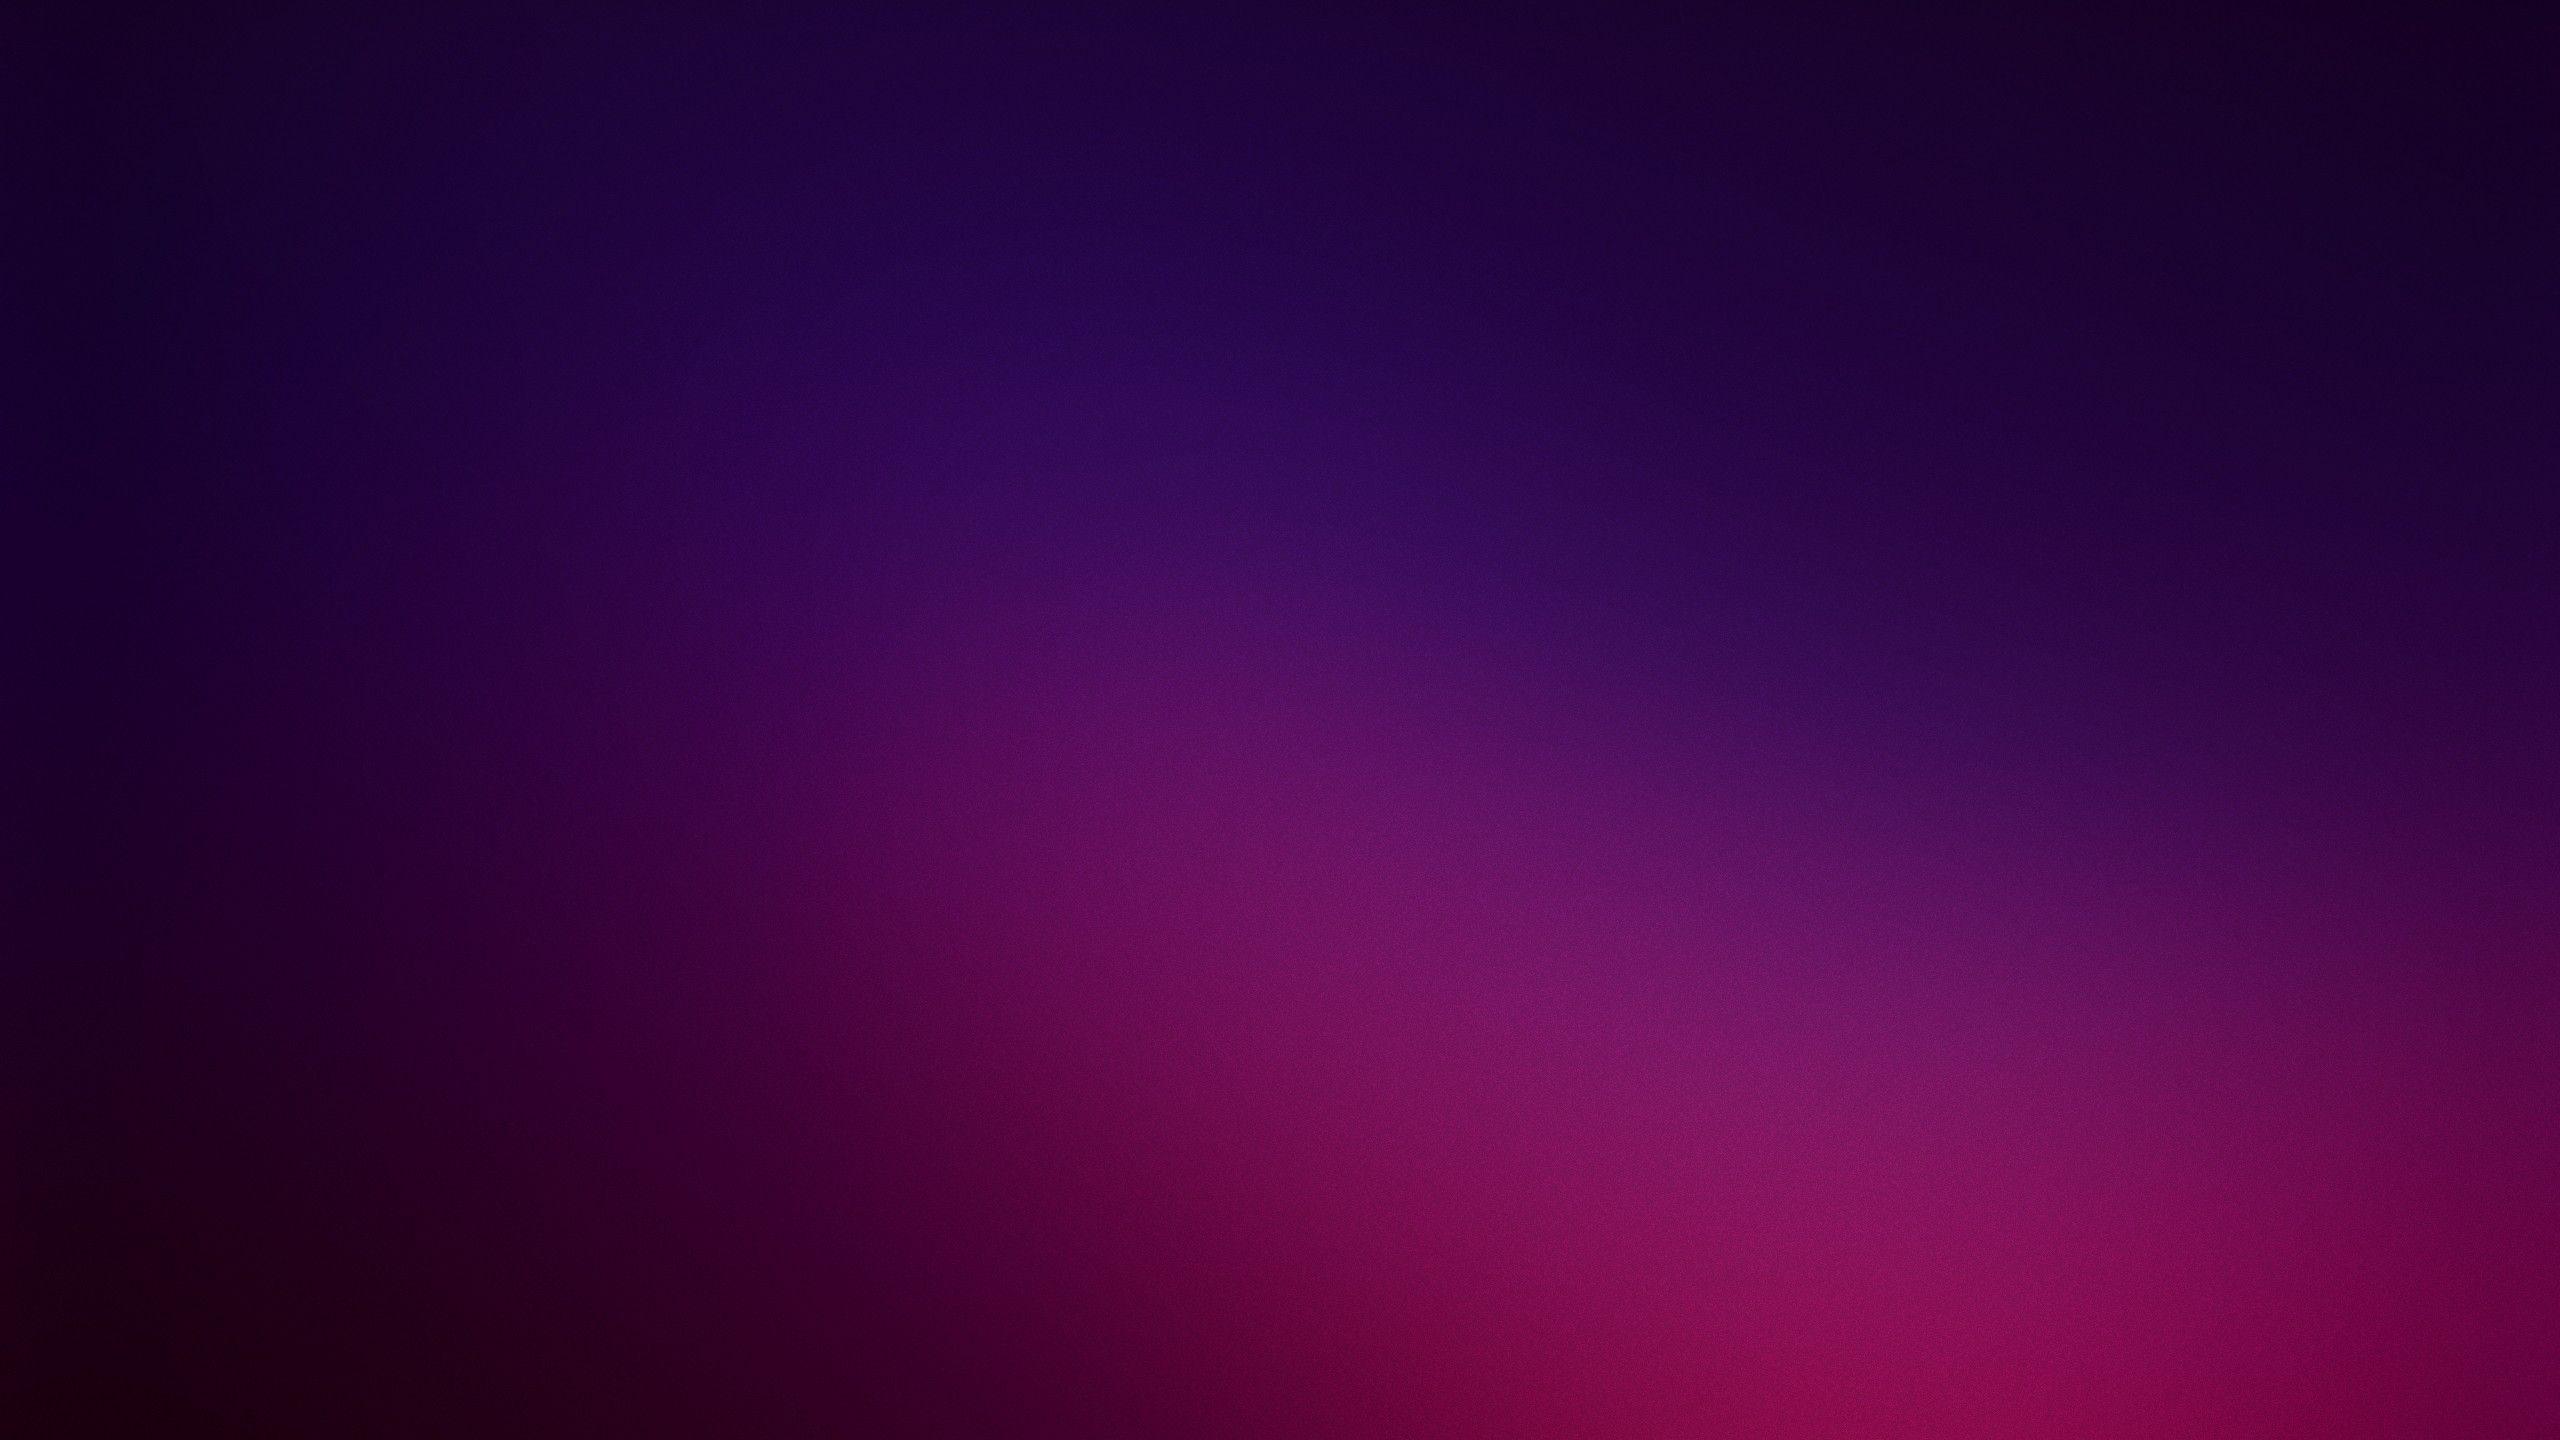 Wallpaper Windows 10 3d Backgrounds Hd 1080p Group 86